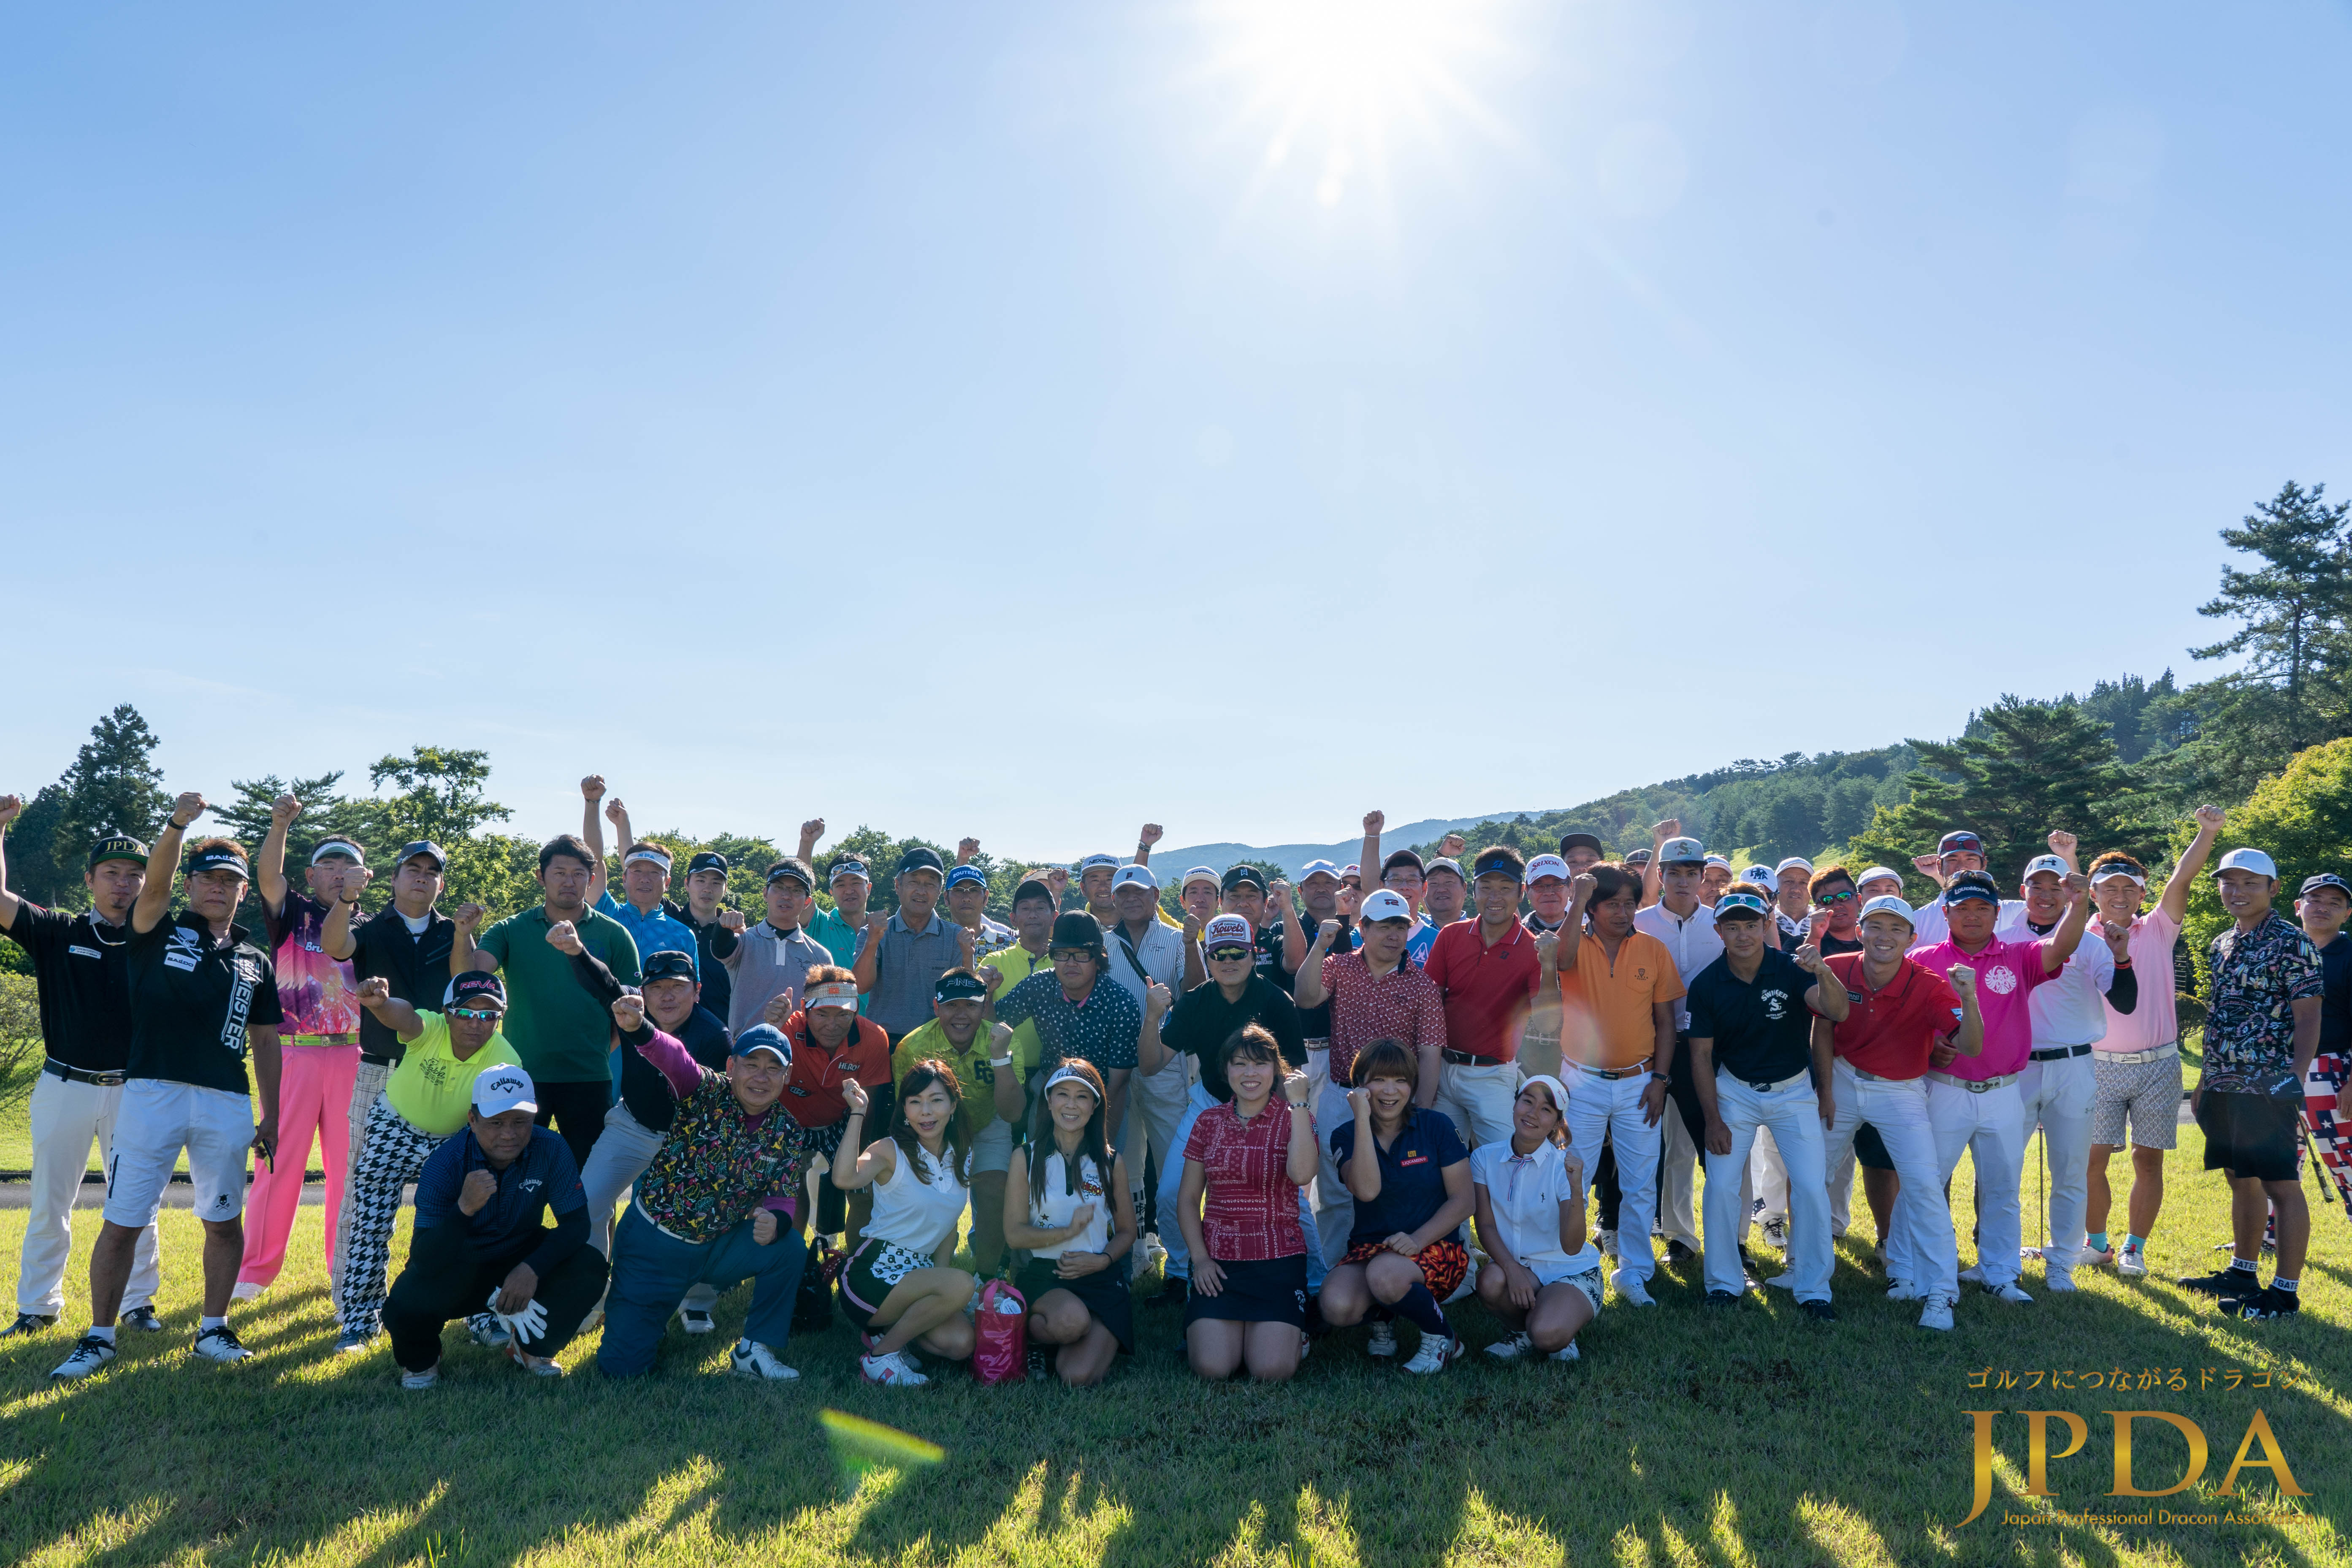 JPDAドラコン大会 飛びゴル28 参加者集合写真